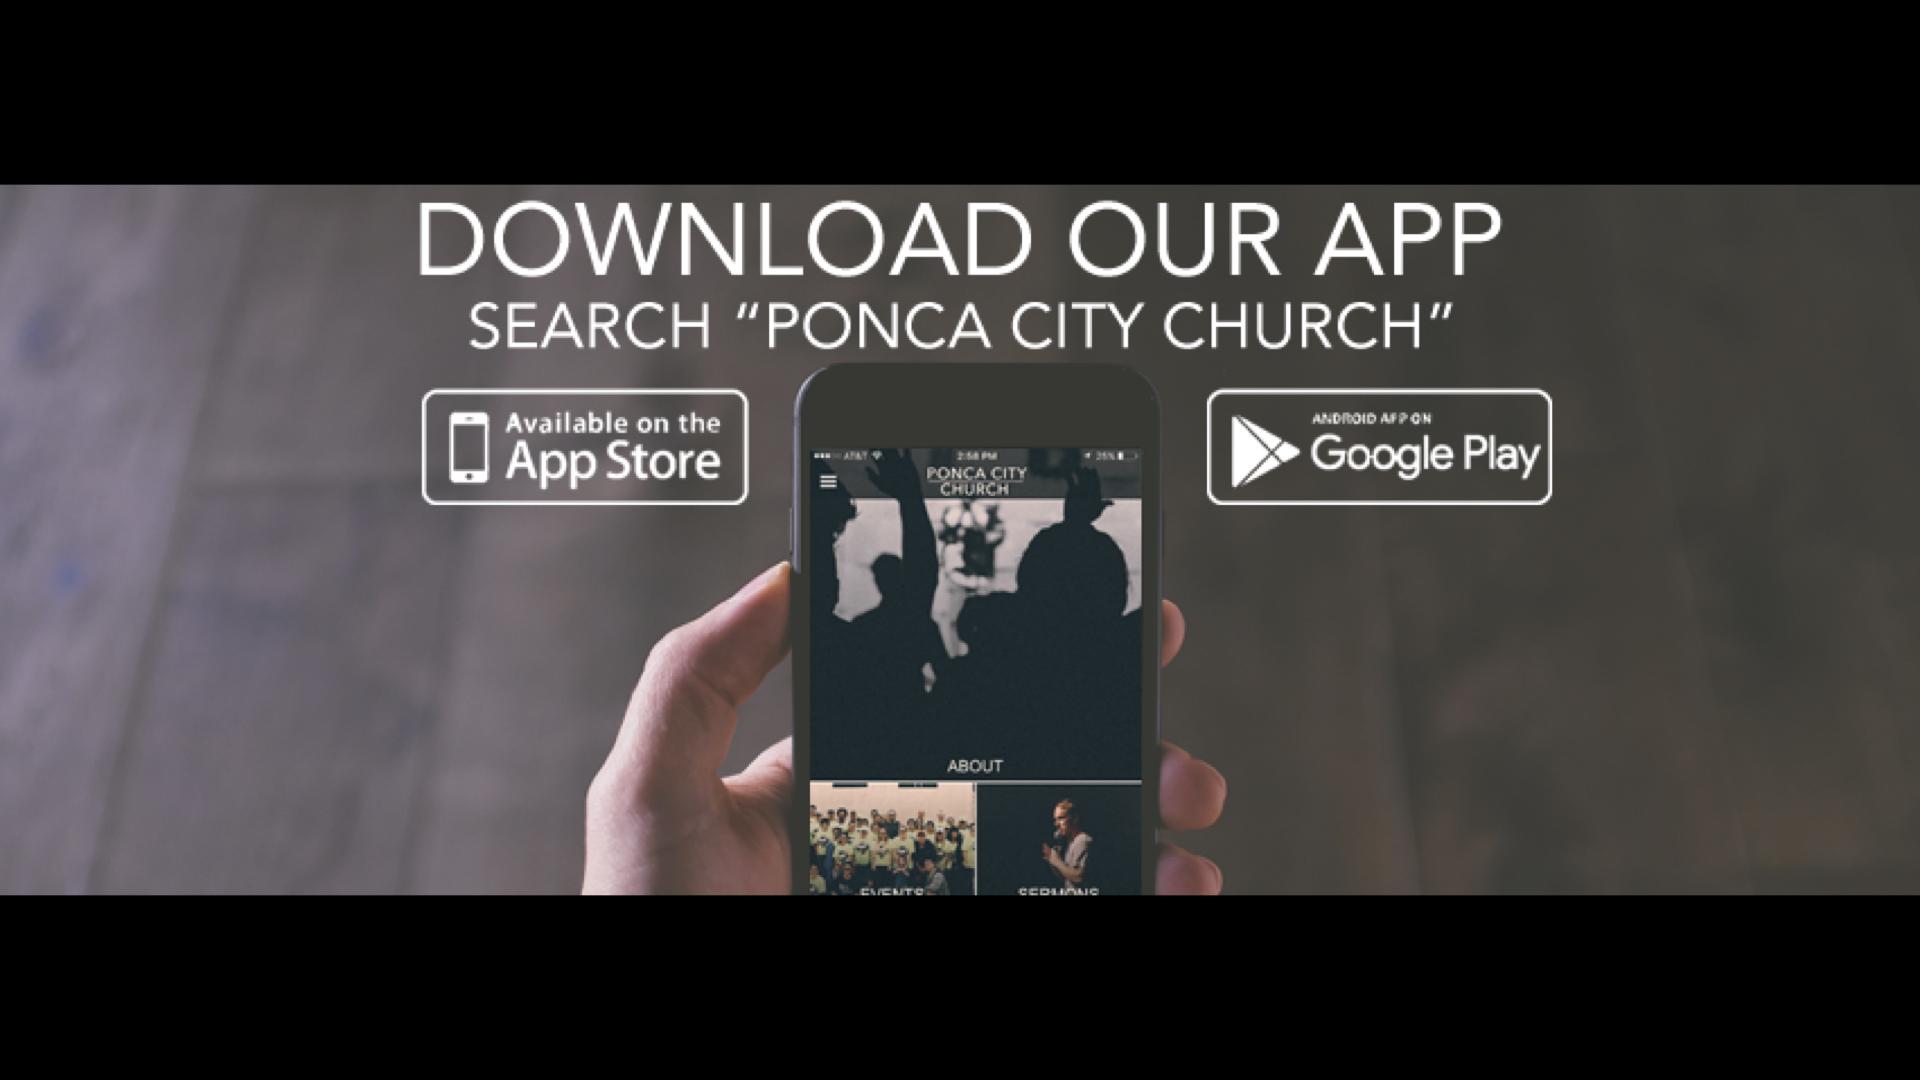 Ponca City Church Forponcacity